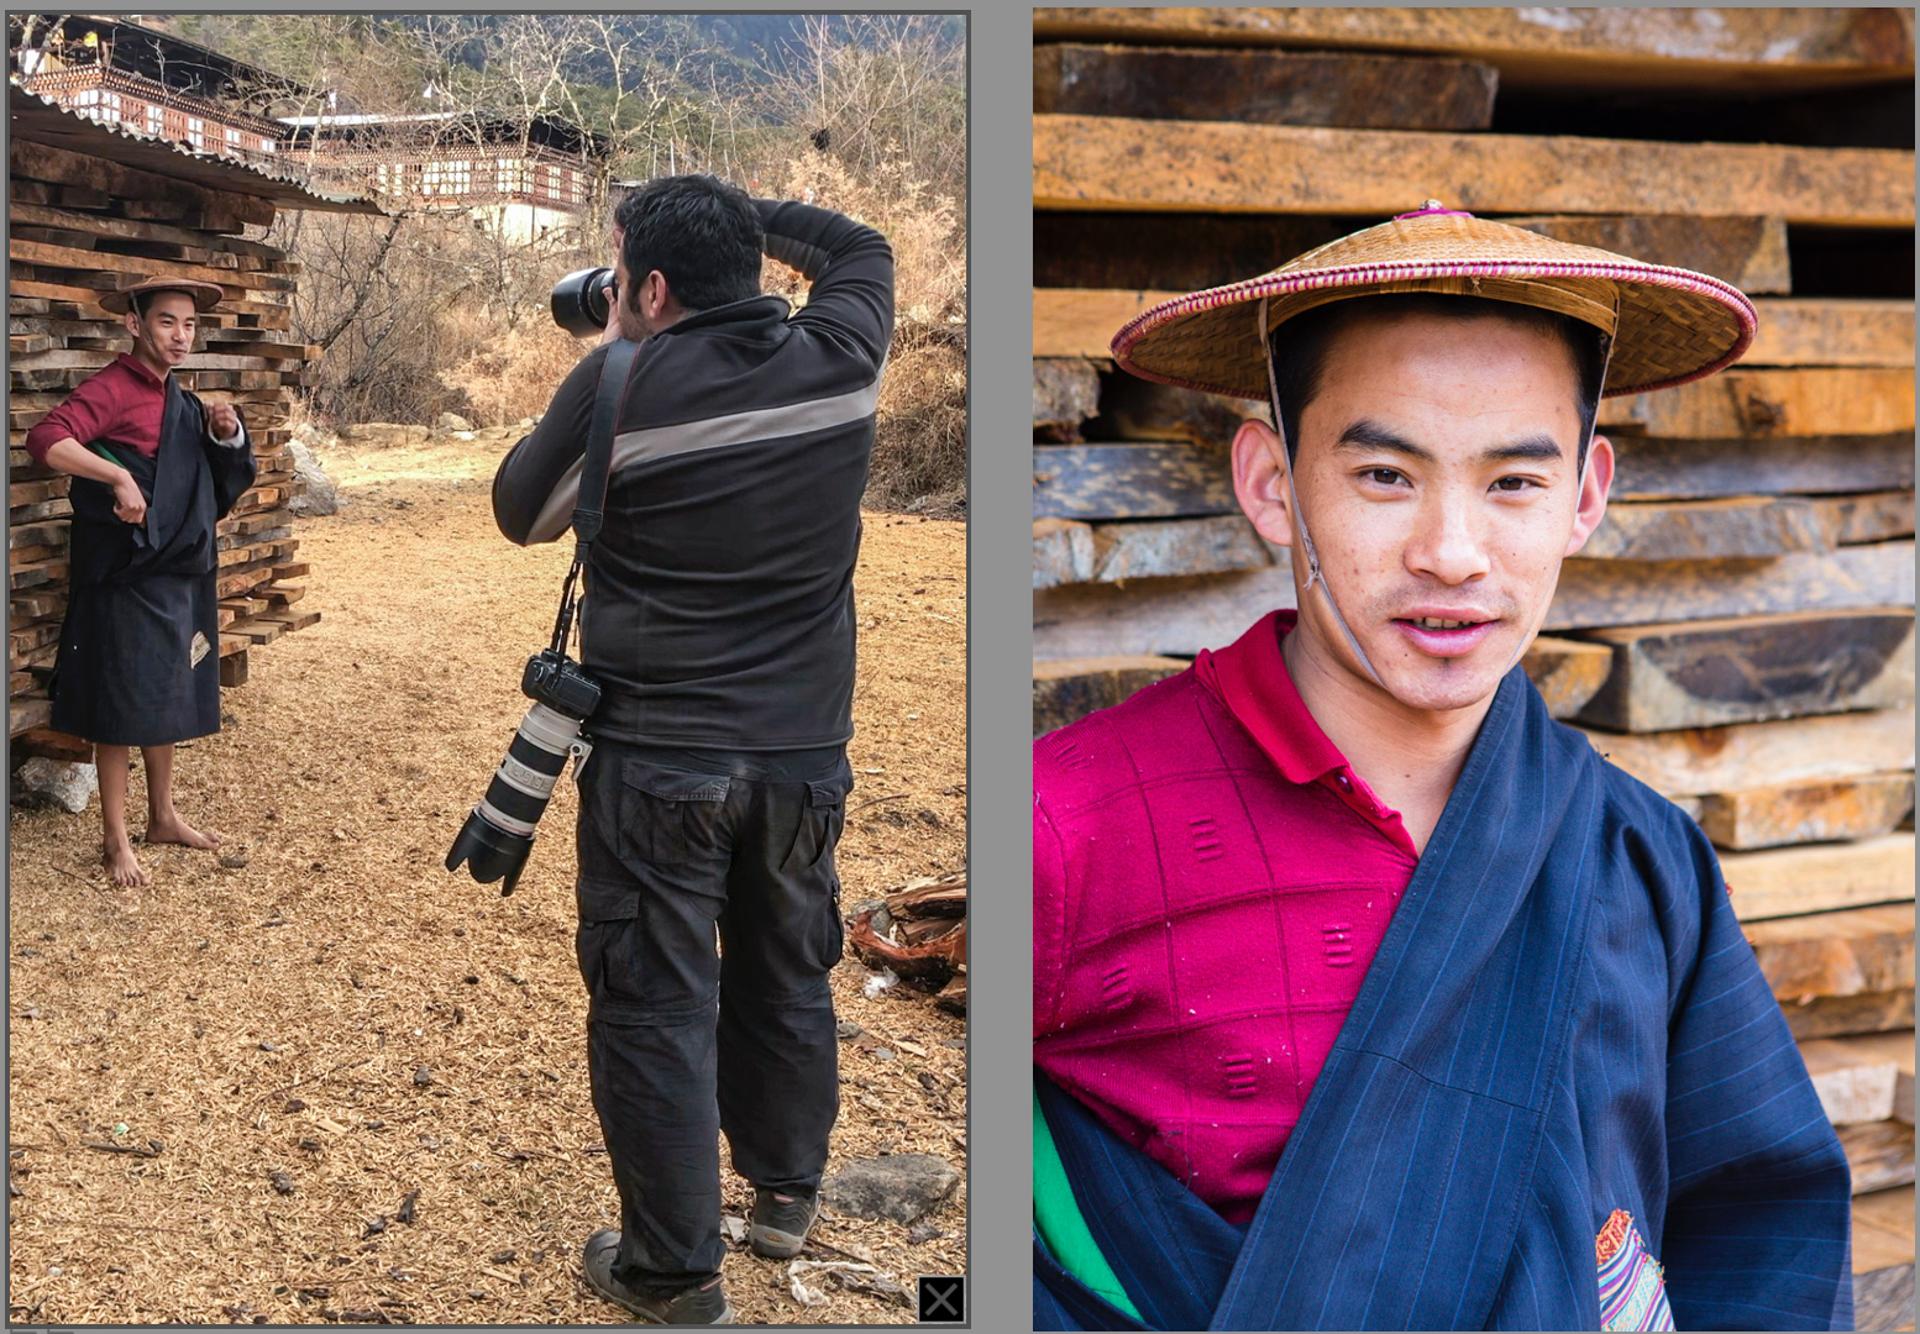 Photographer taking a portrait picture